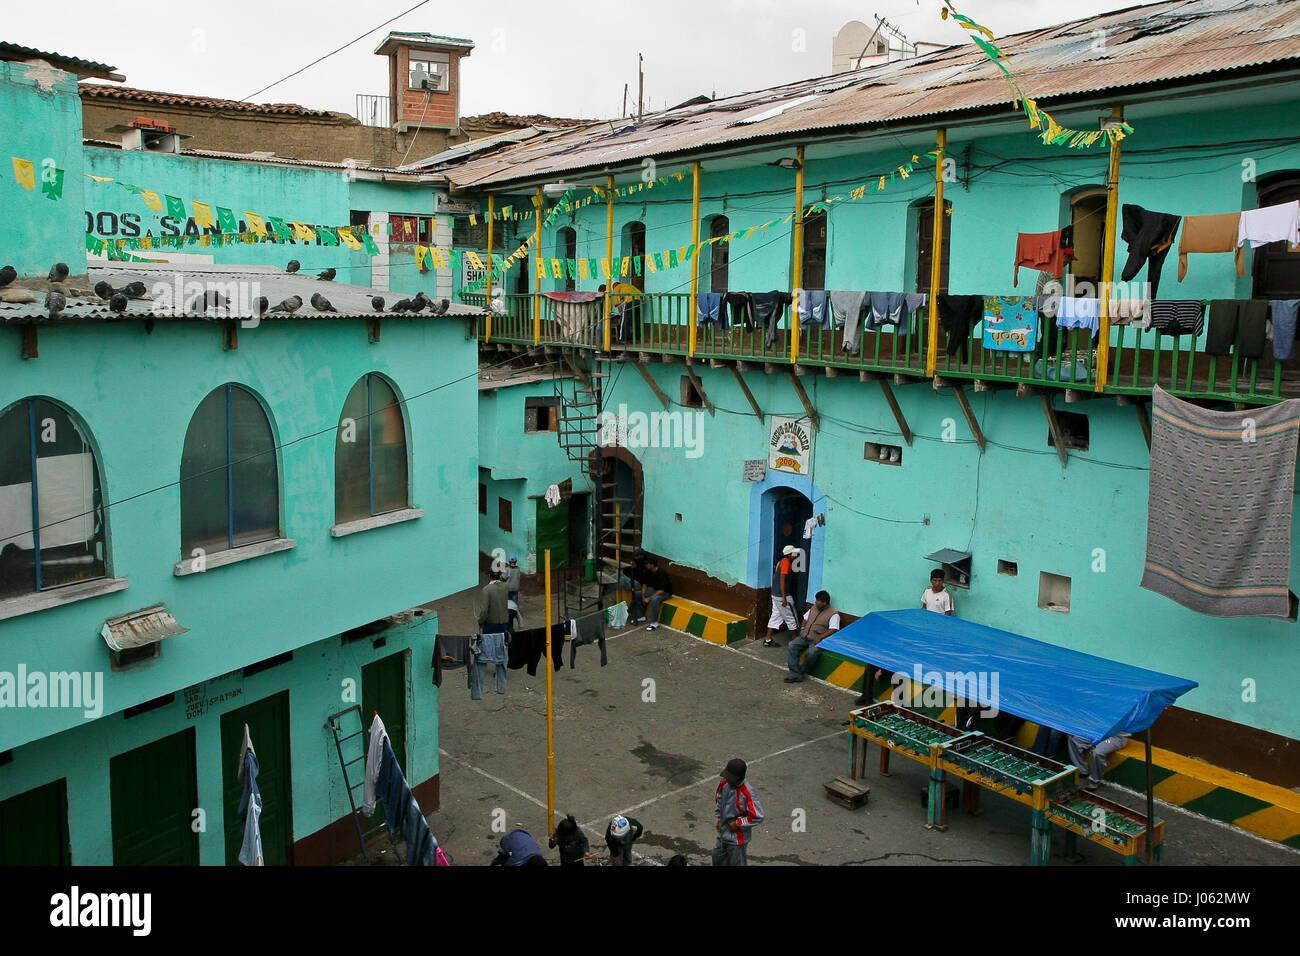 San Pedro, Republic of Prisoners